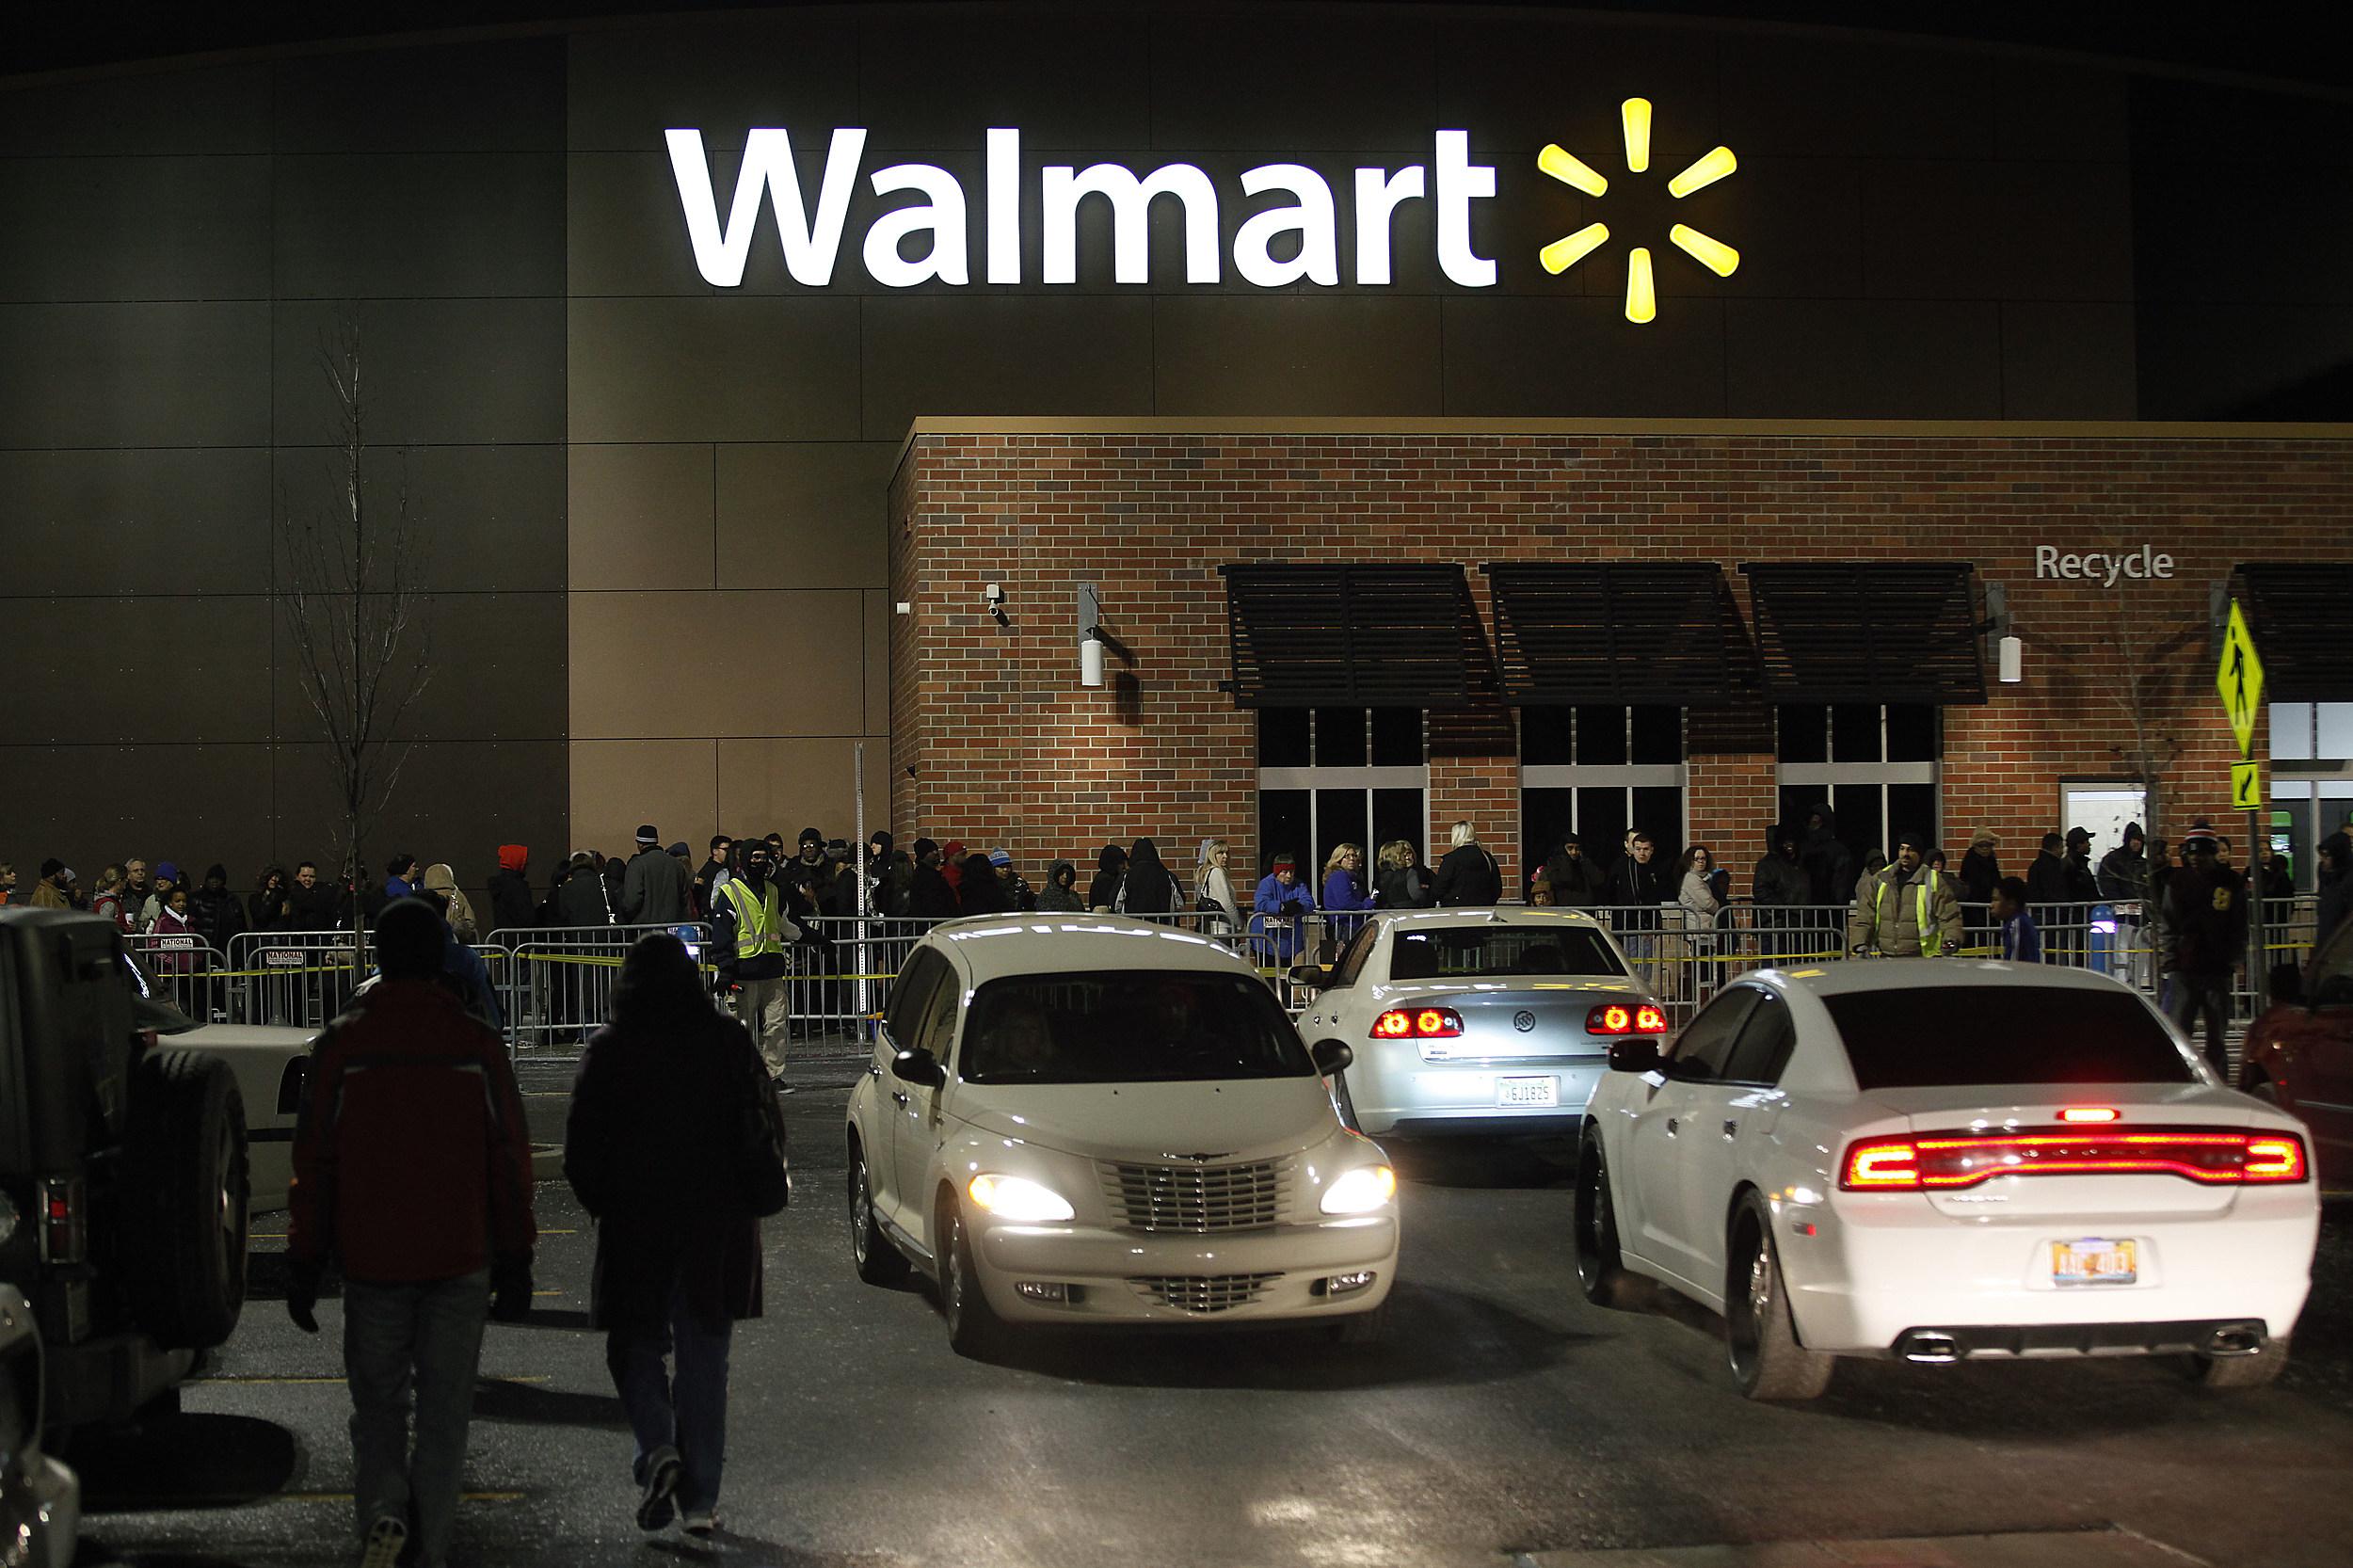 North Dakota\'s Top Selling Item from Walmart.com Makes No Sense